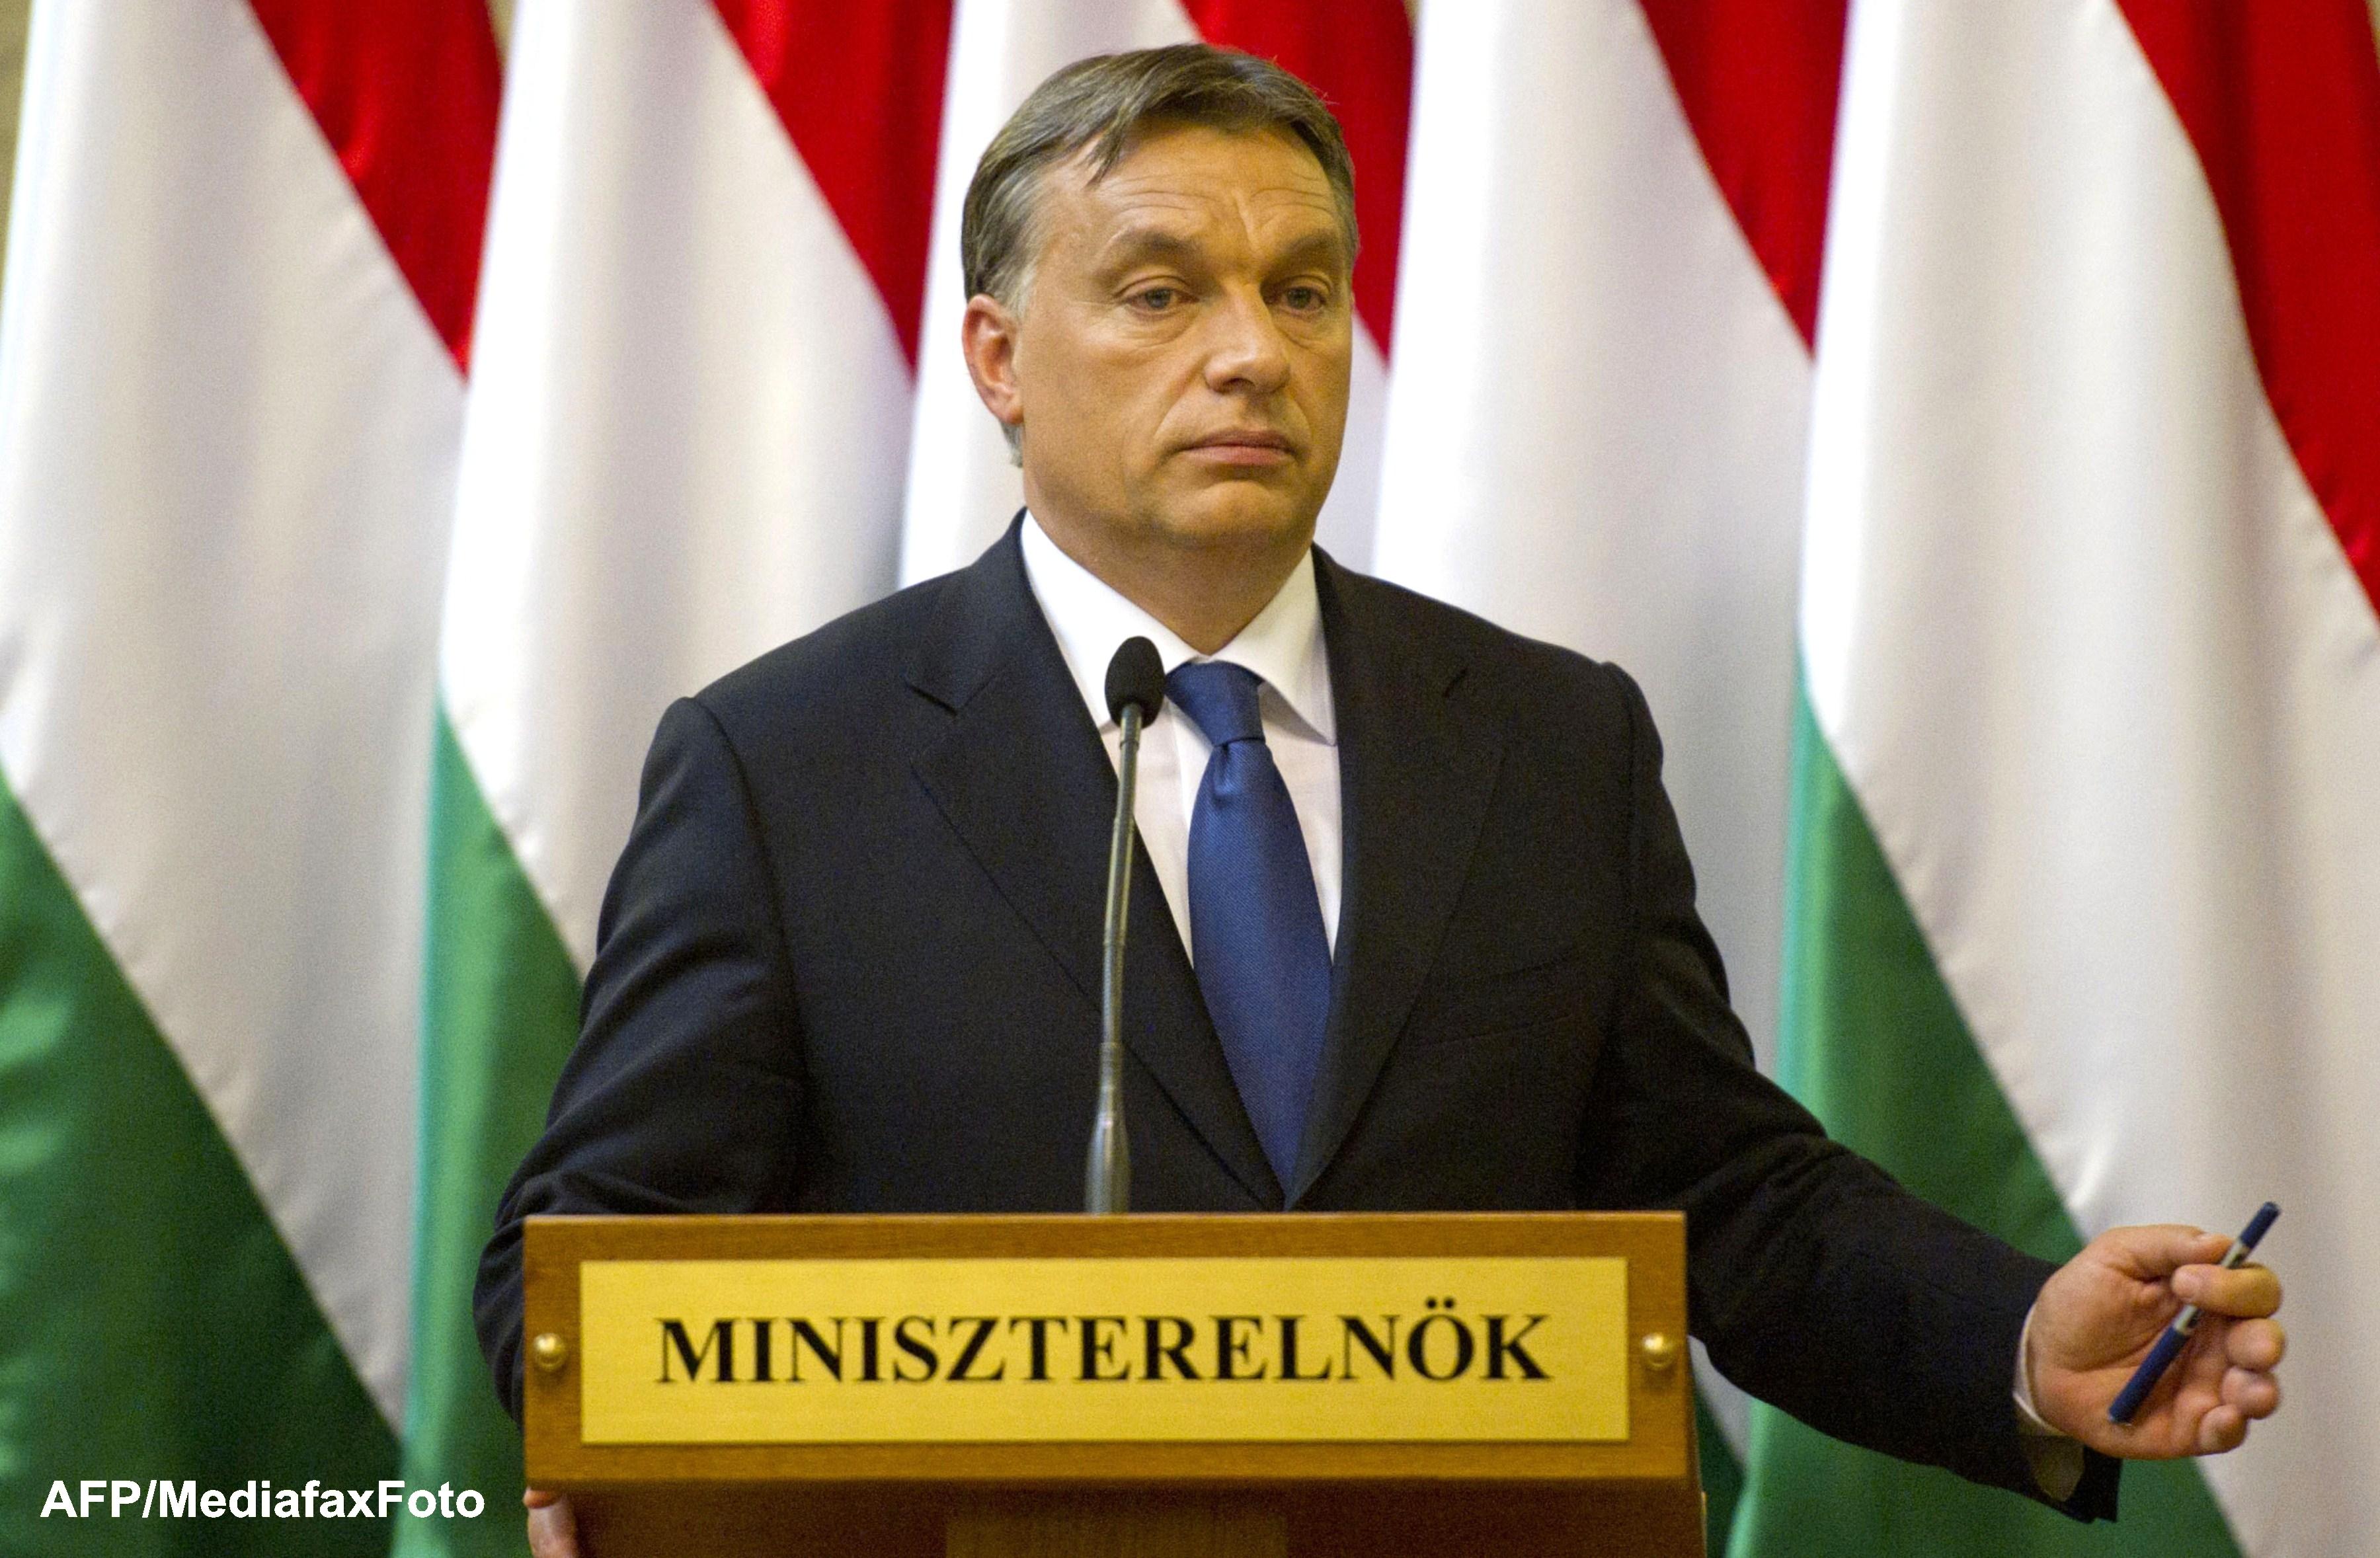 AFP: Viktor Orban isi radicalizeaza discursul ca sa